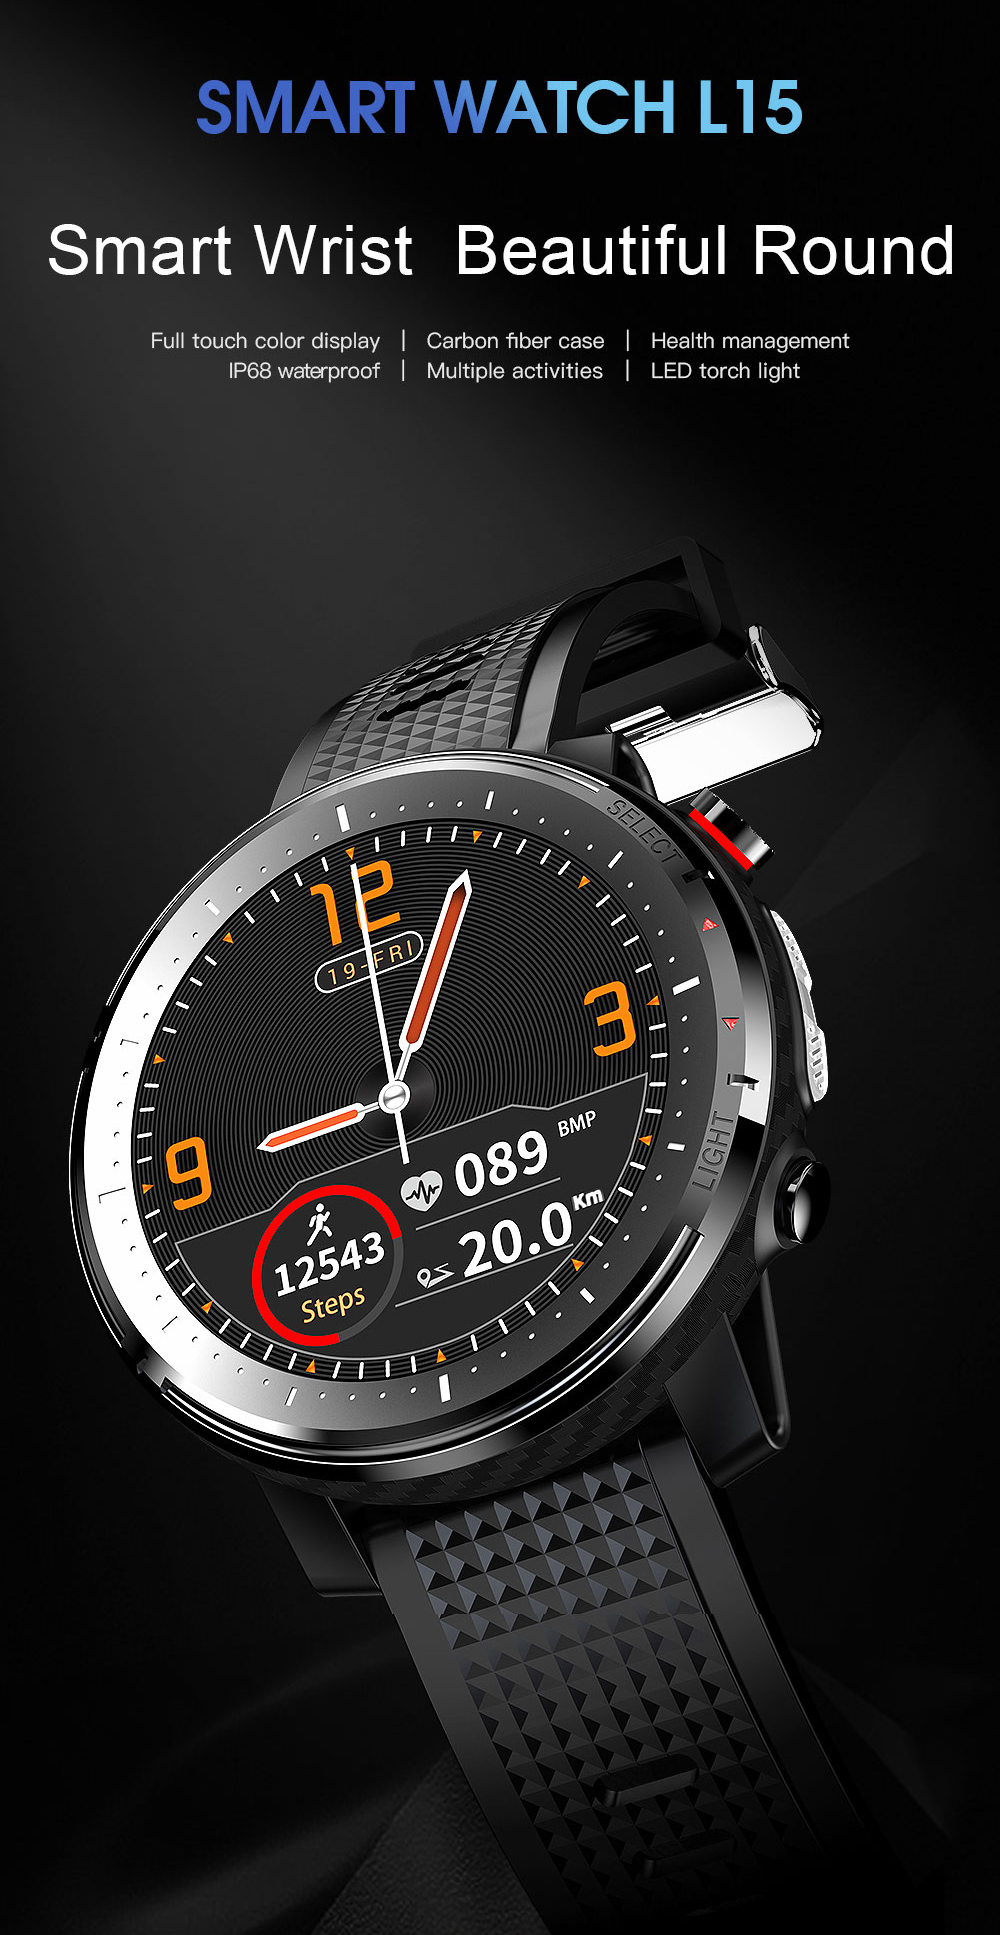 Hbd7af1d1235346a98773087f055021c0Q Timewolf Reloj Inteligente Smart Watch Men 2021 IP68 Waterproof Android Smartwatch Smart Watch for Men Women Android Phone IOS